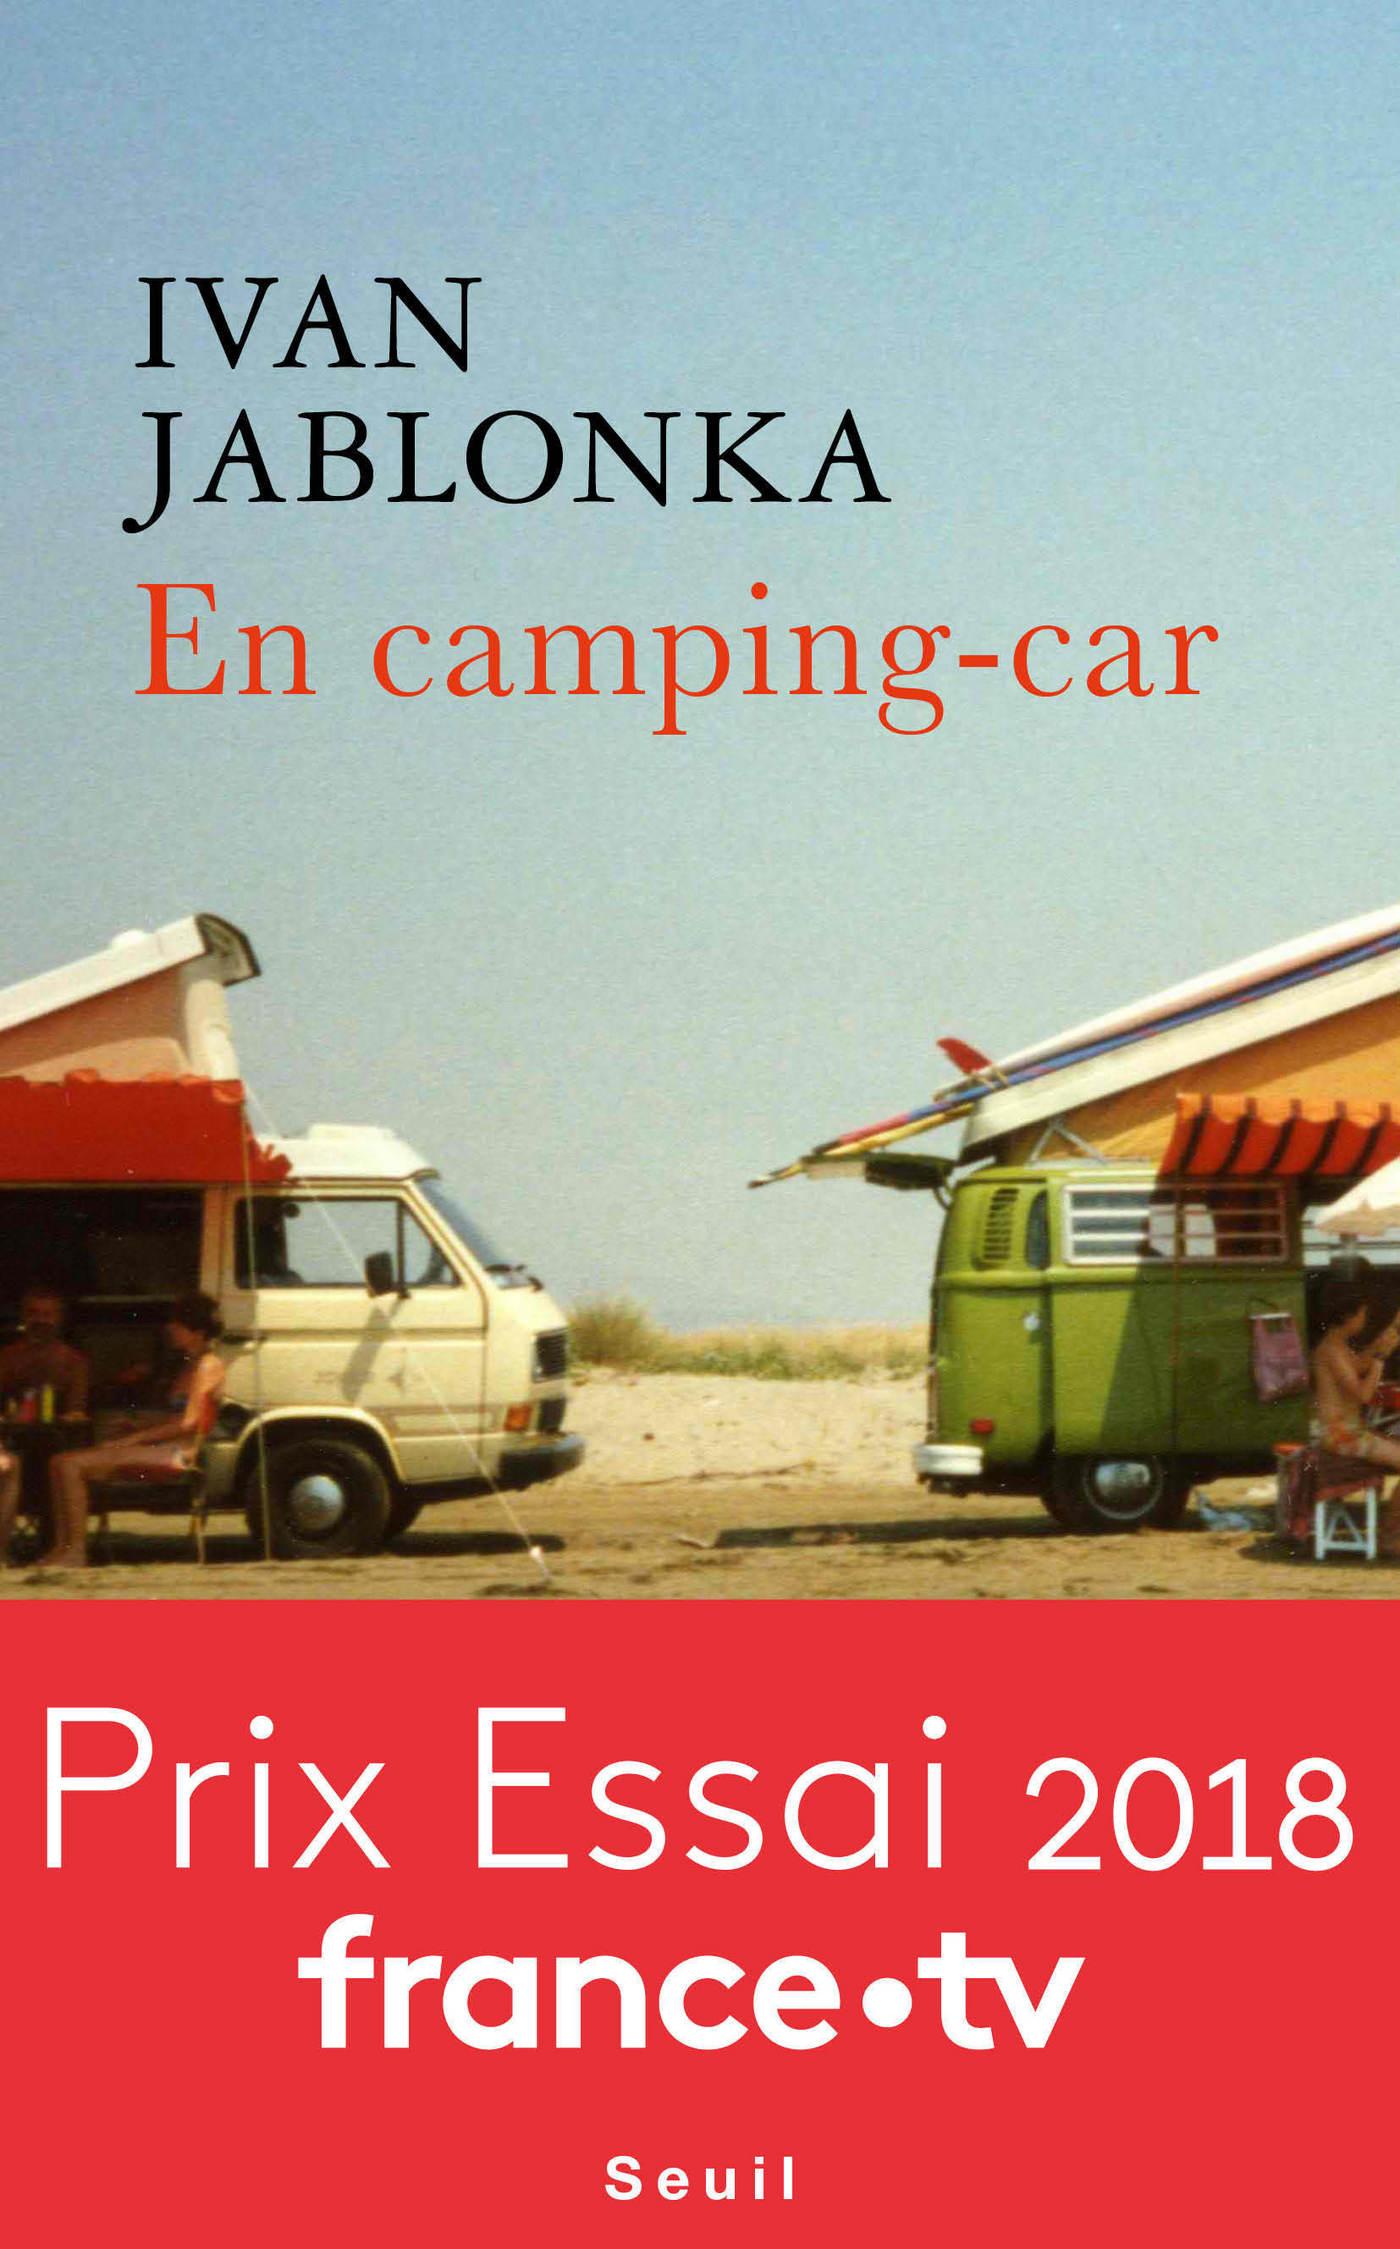 En camping-car